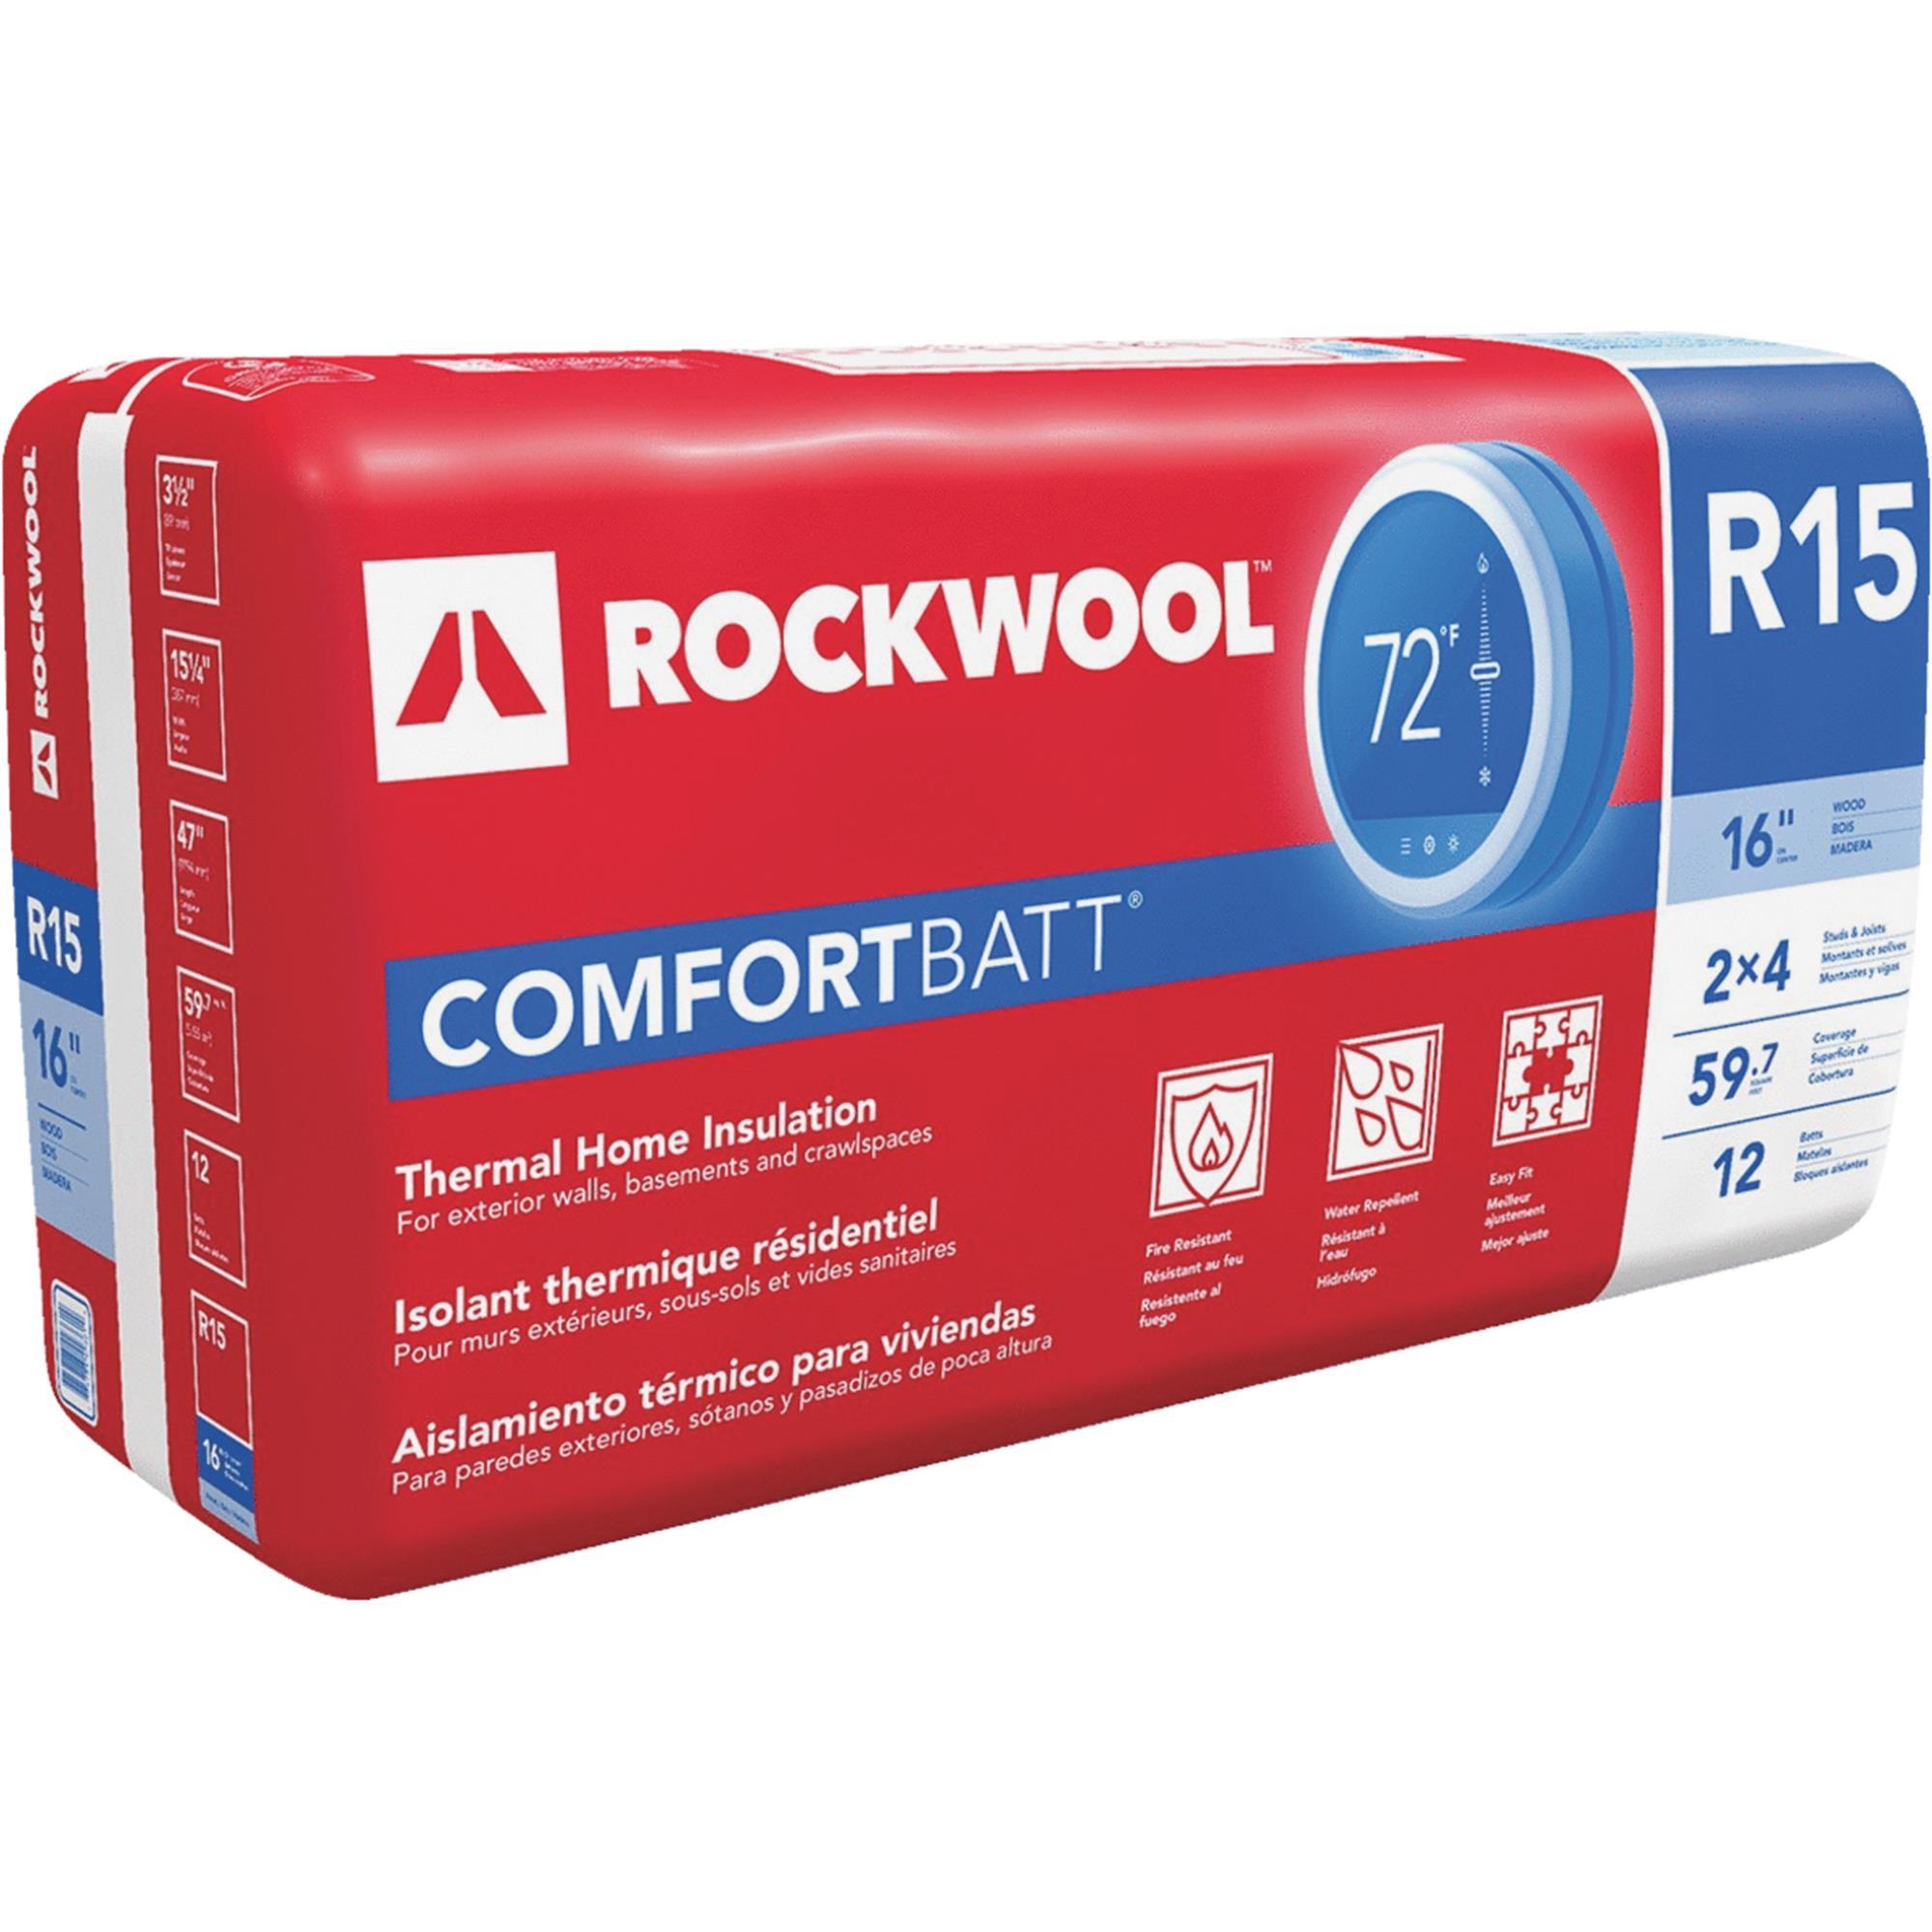 Rockwool Comfortbatt Stone Wool Insulation Walmart Com